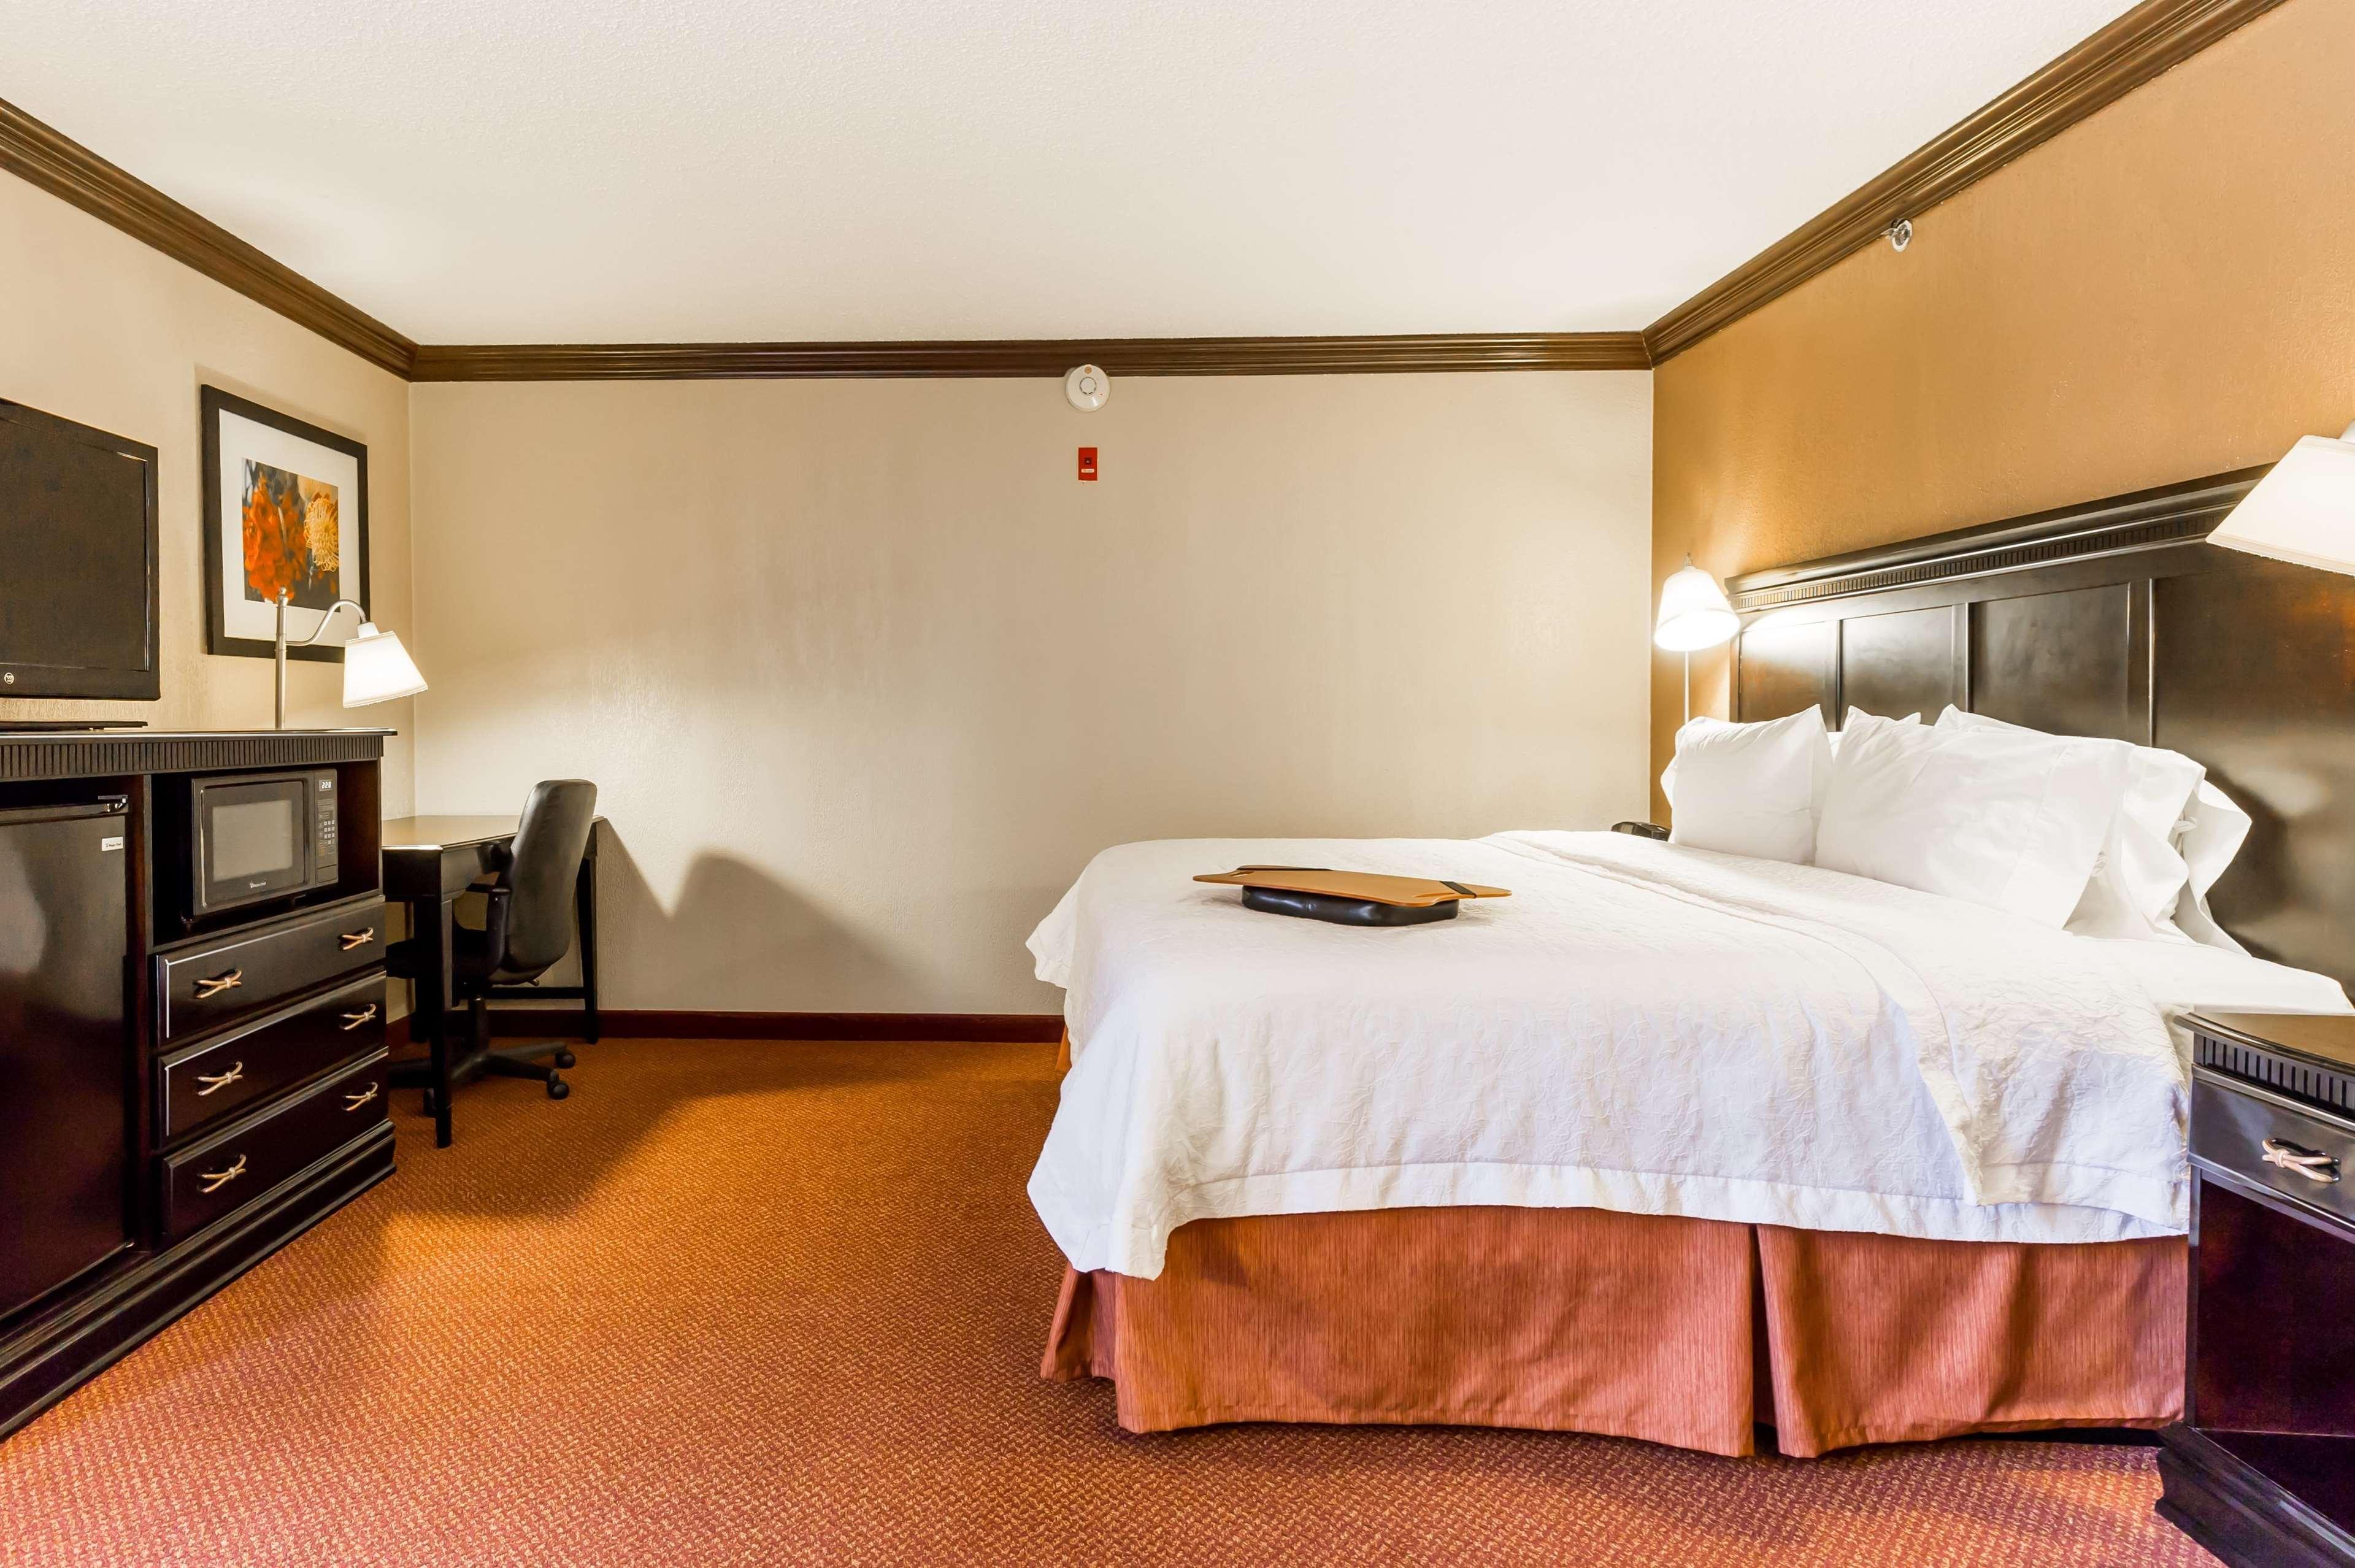 Hampton Inn & Suites Chicago/Hoffman Estates image 48